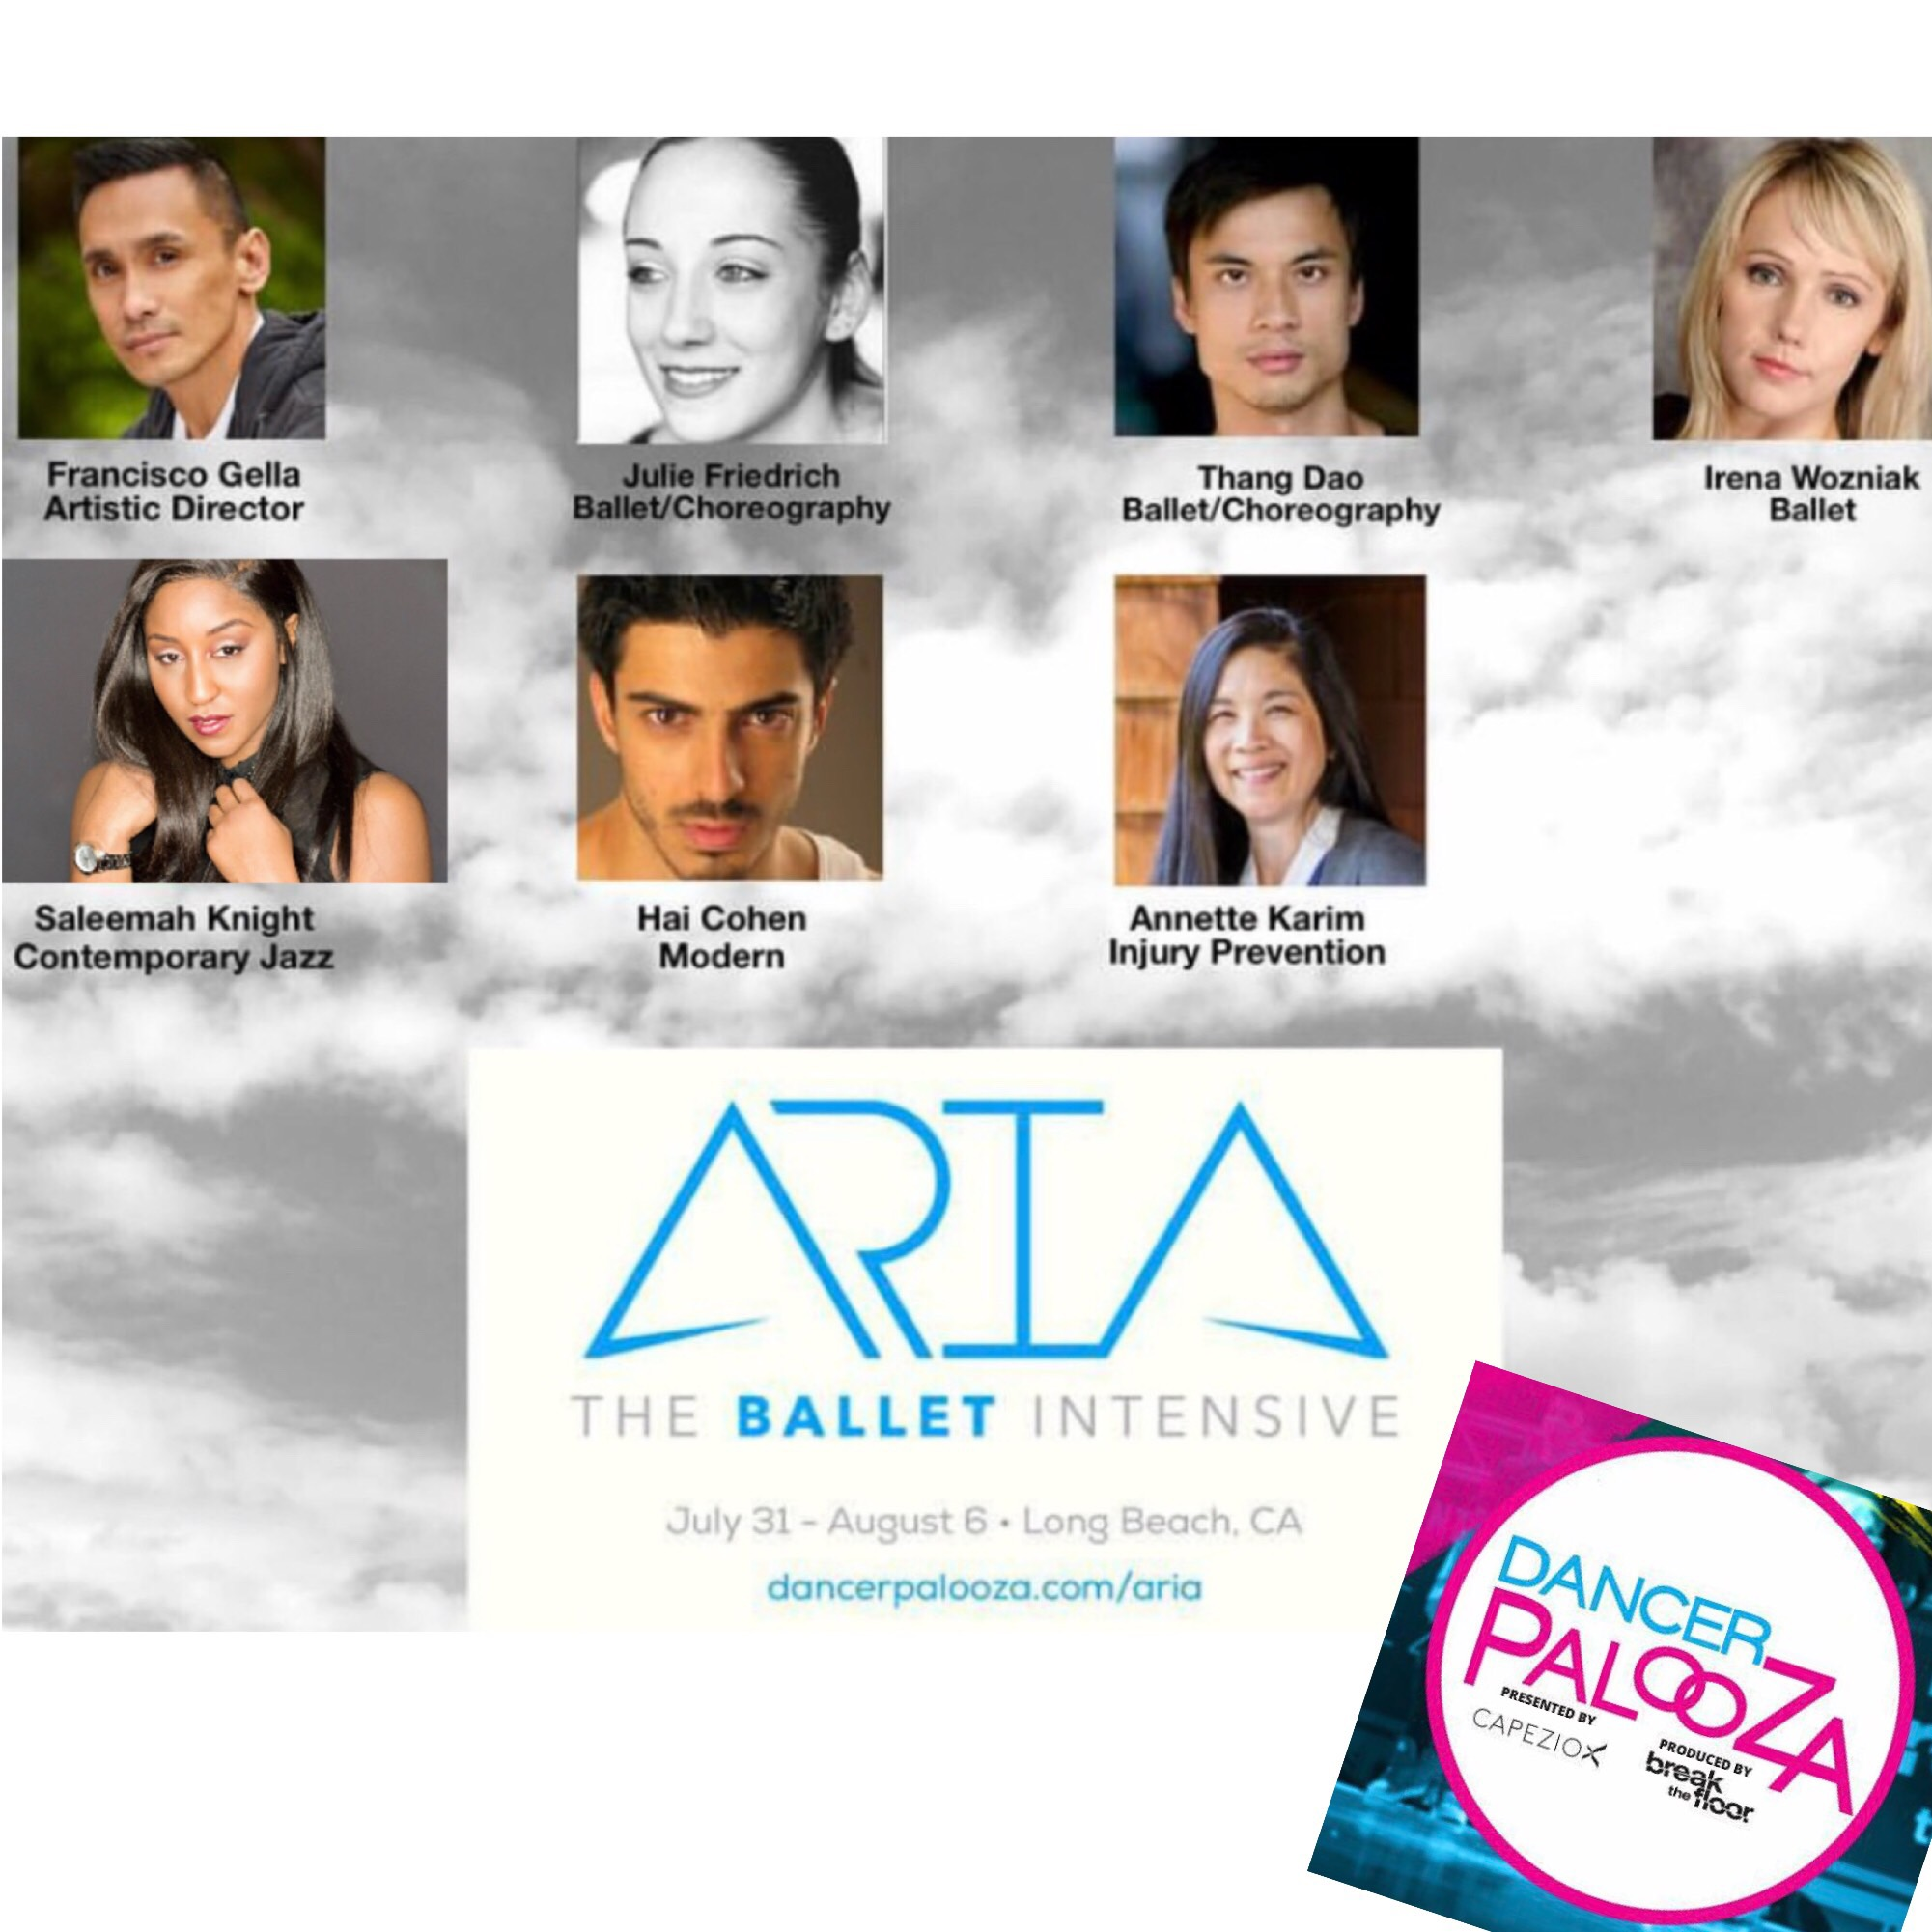 Dancer Palooza/ Aria Ballet Intensive 2017